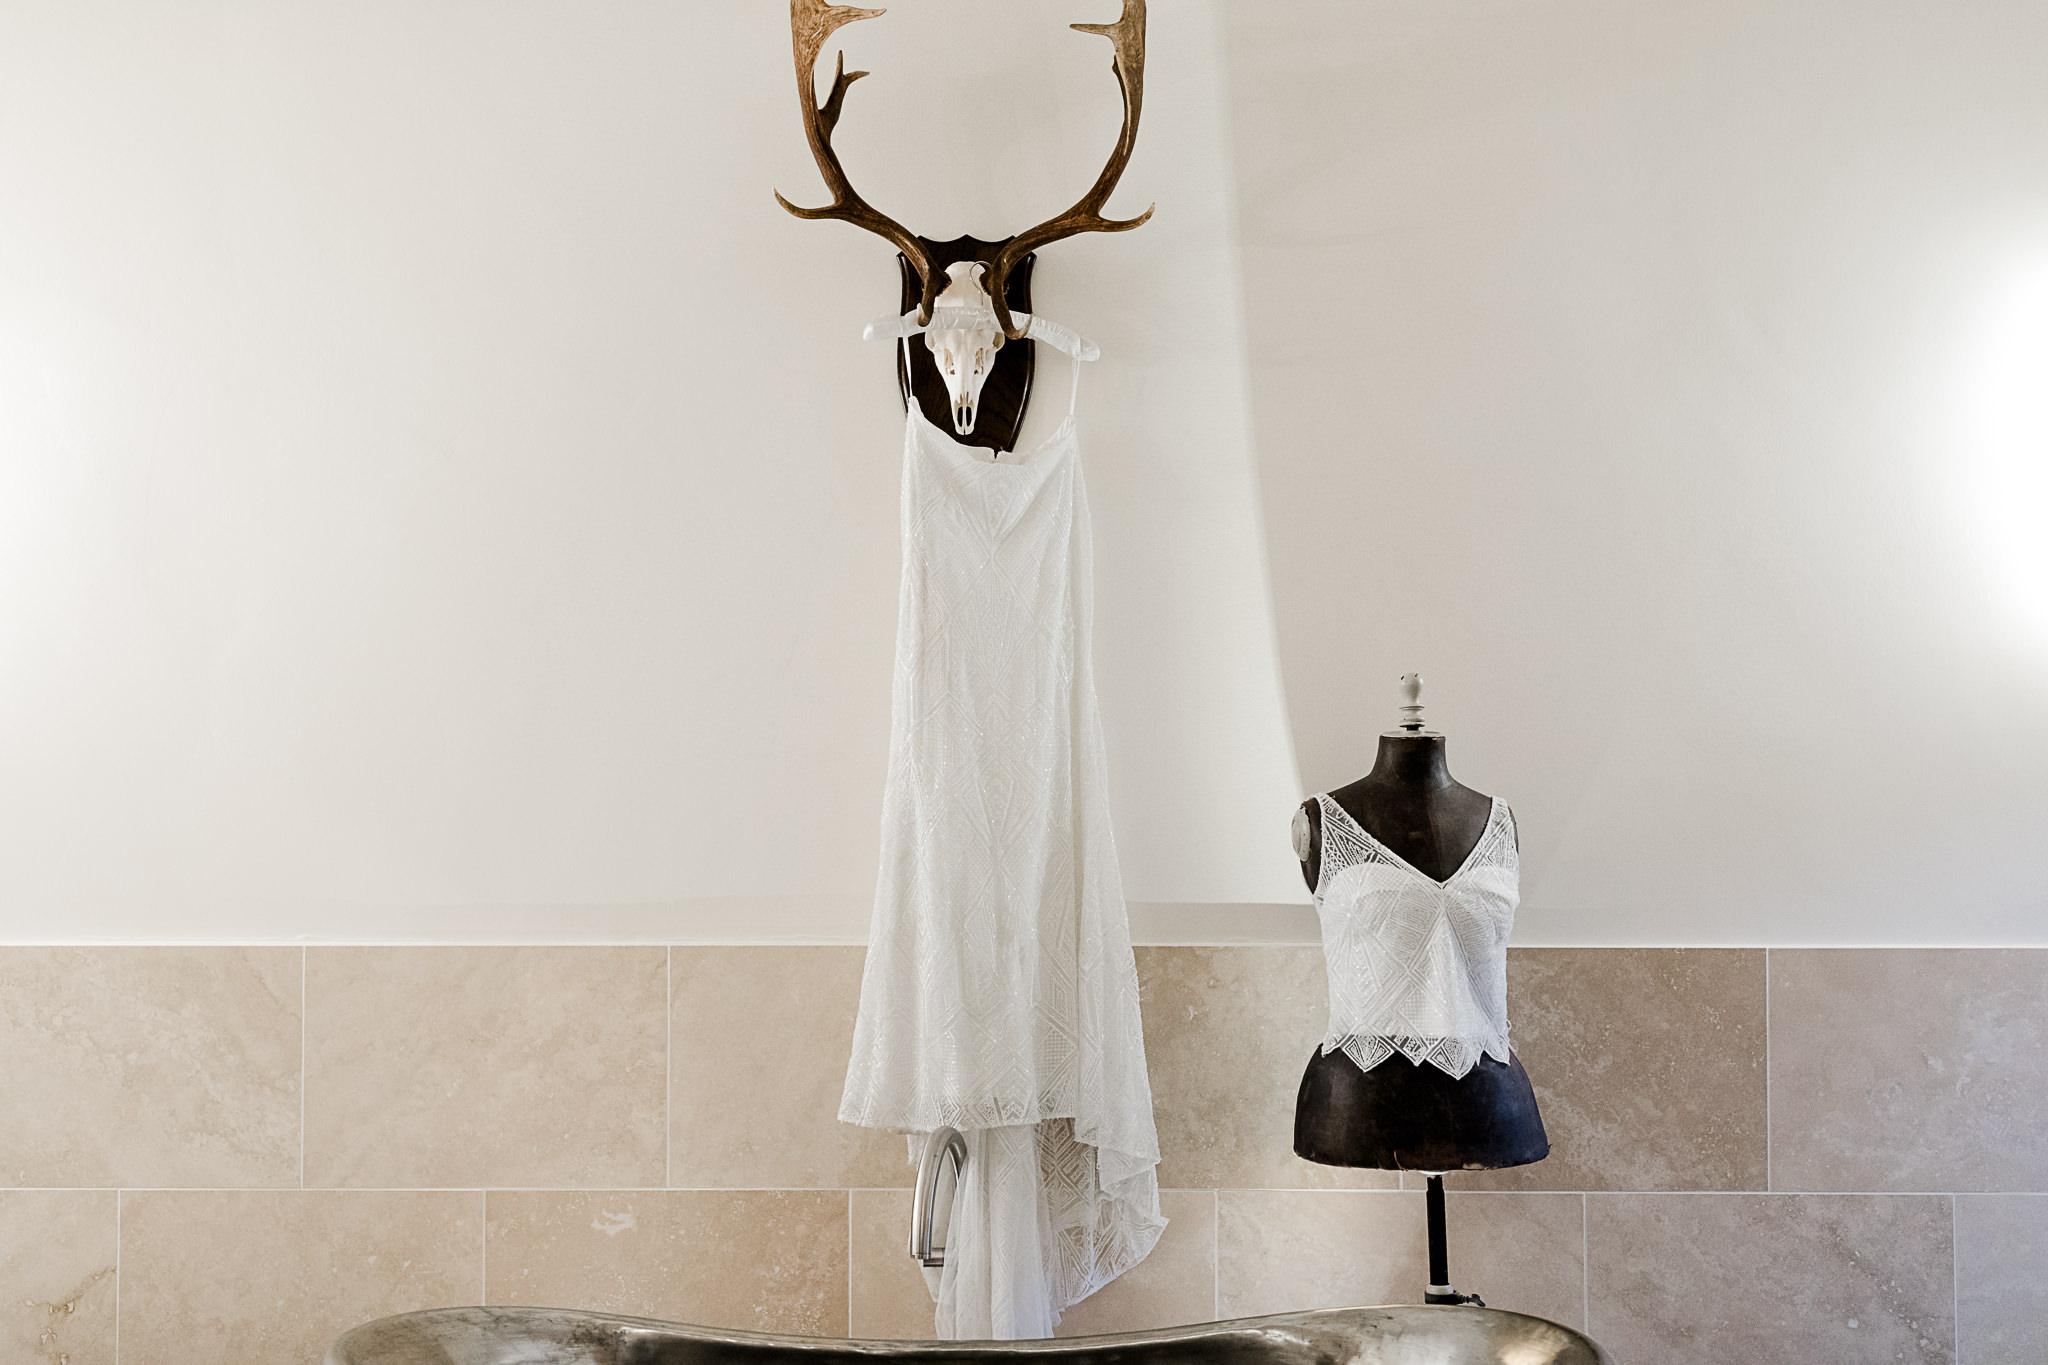 The Gathering Barn Wedding - Art by Design Photography - Wedding Dress